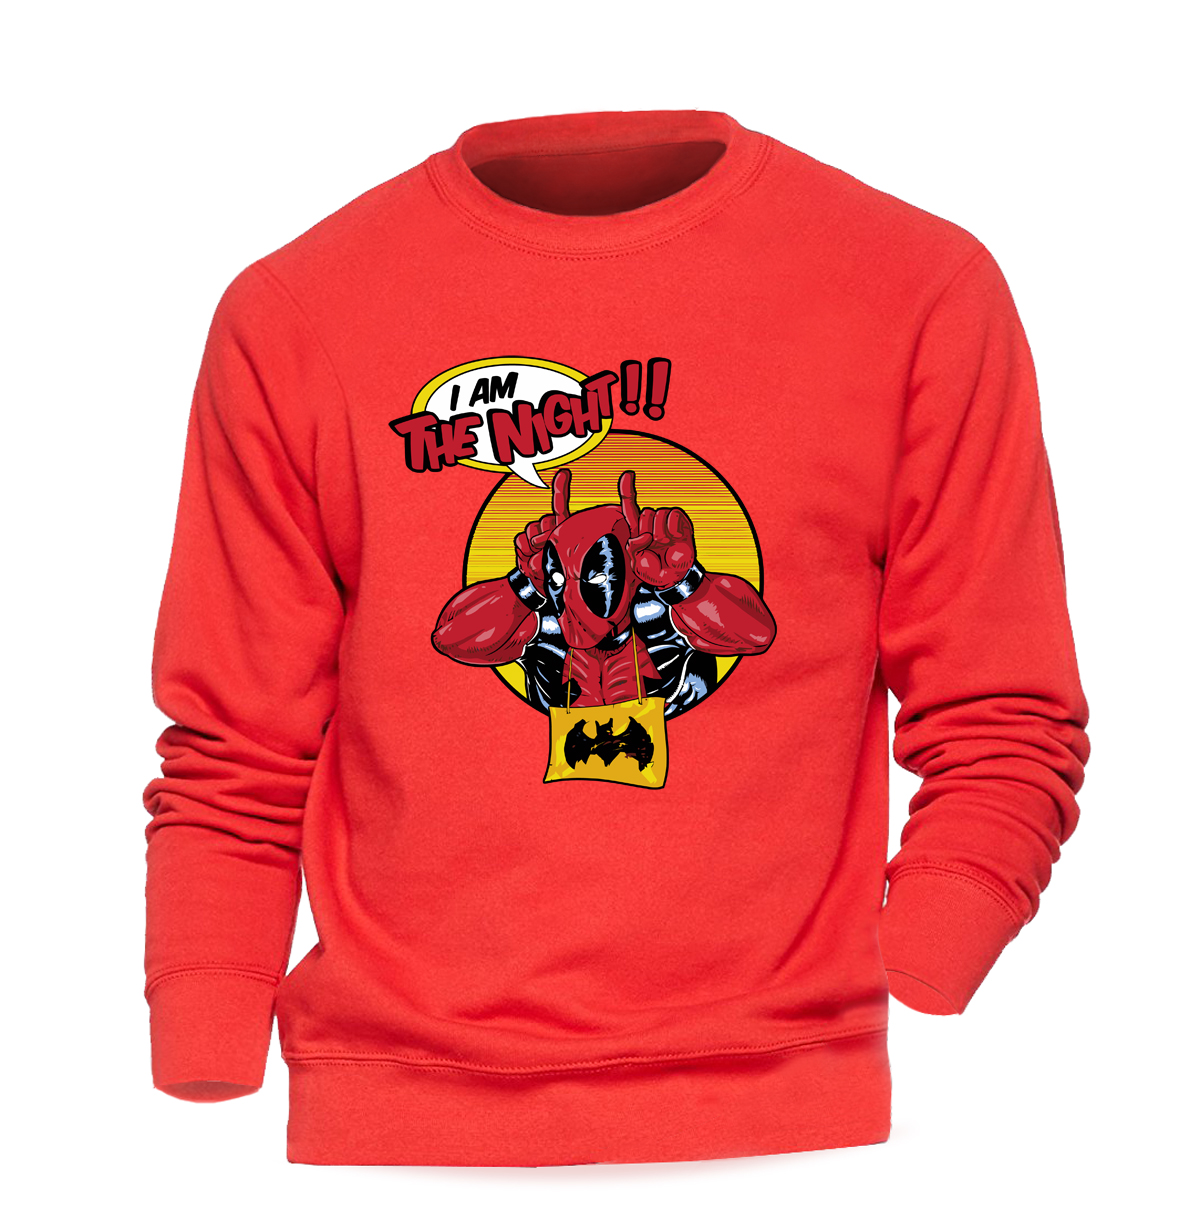 Super Hero Deadpool Hoodie Men I Am The Night Sweatshirt Funny Printed Crewneck Sweatshirts Winter Autumn Dead Pool Streetwear